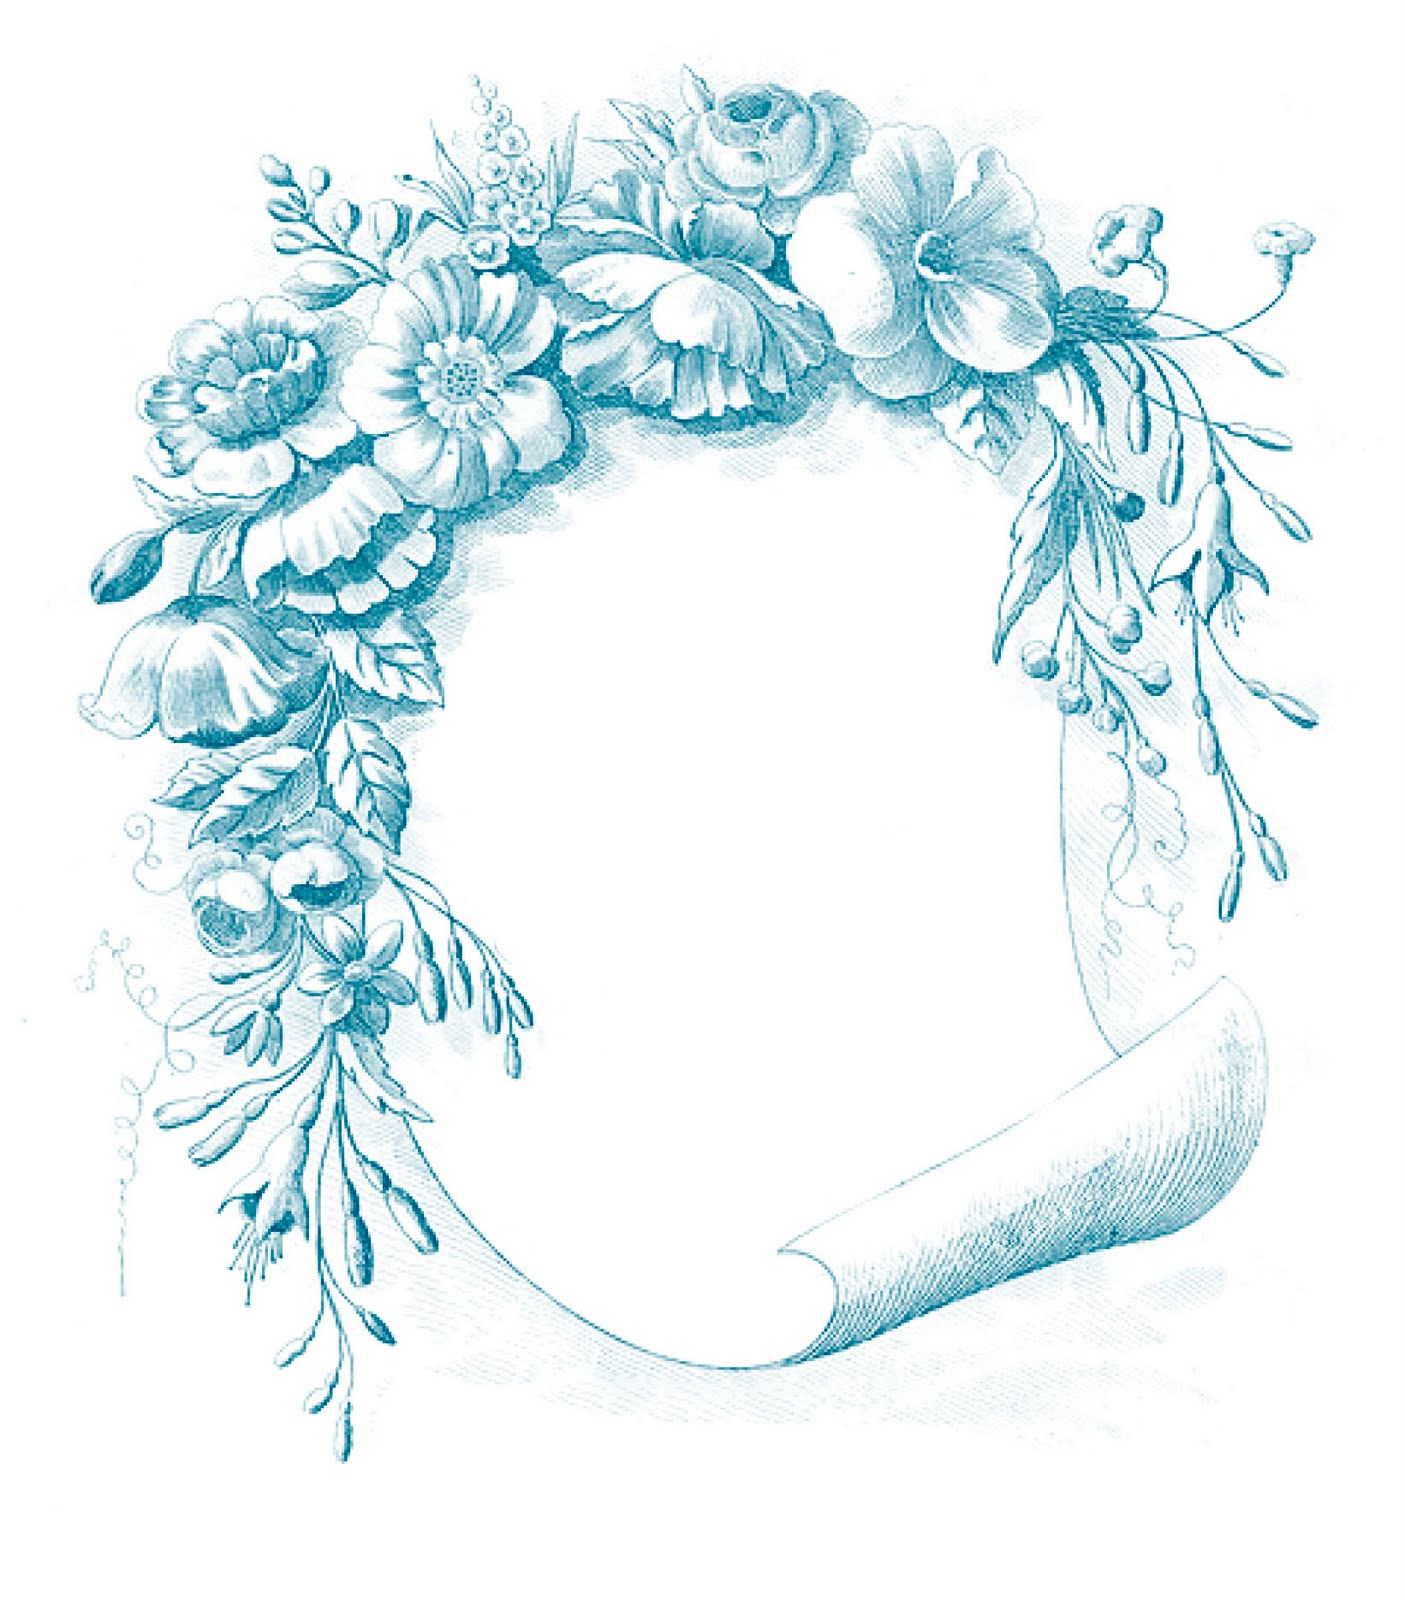 Vintage Clip Art - Gorgeous Floral Frame - The Graphics Fairy